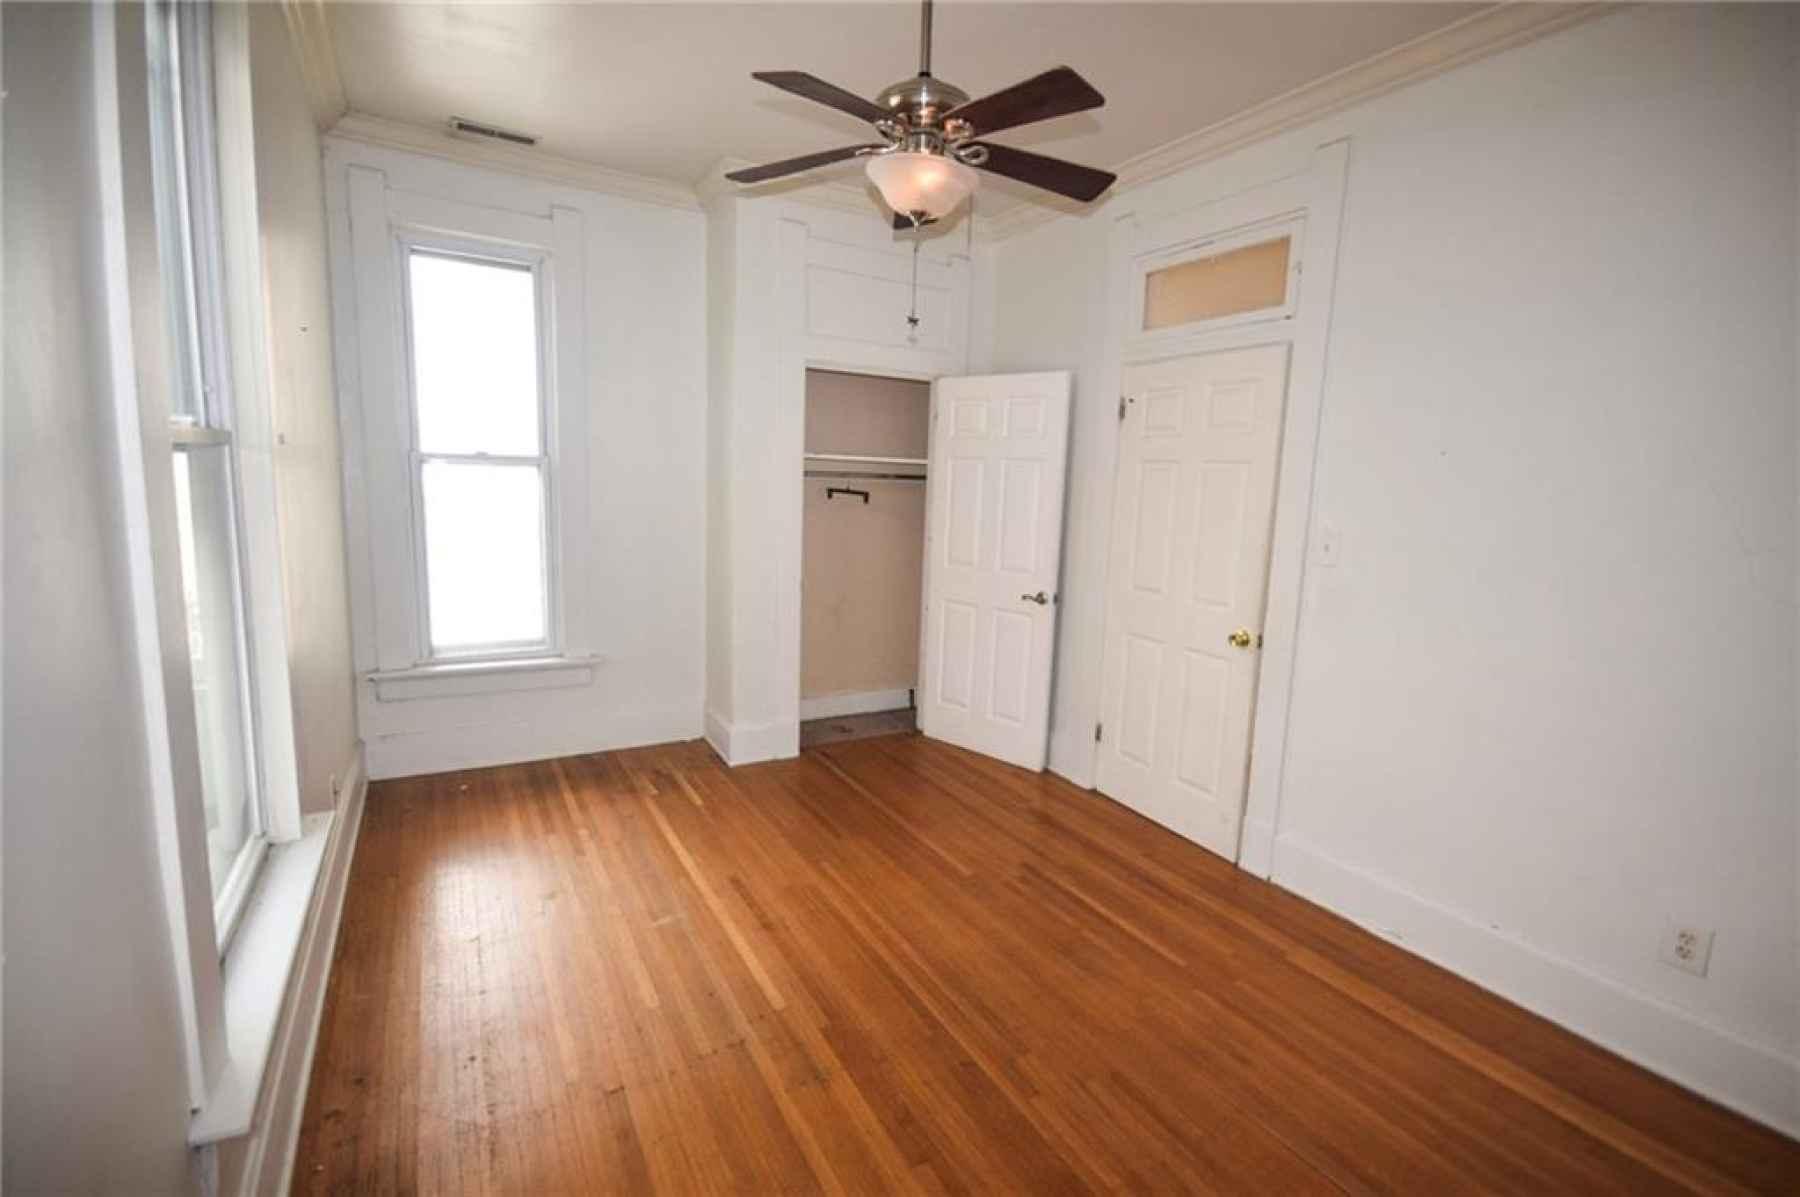 Second floor. Second bedroom full bath.